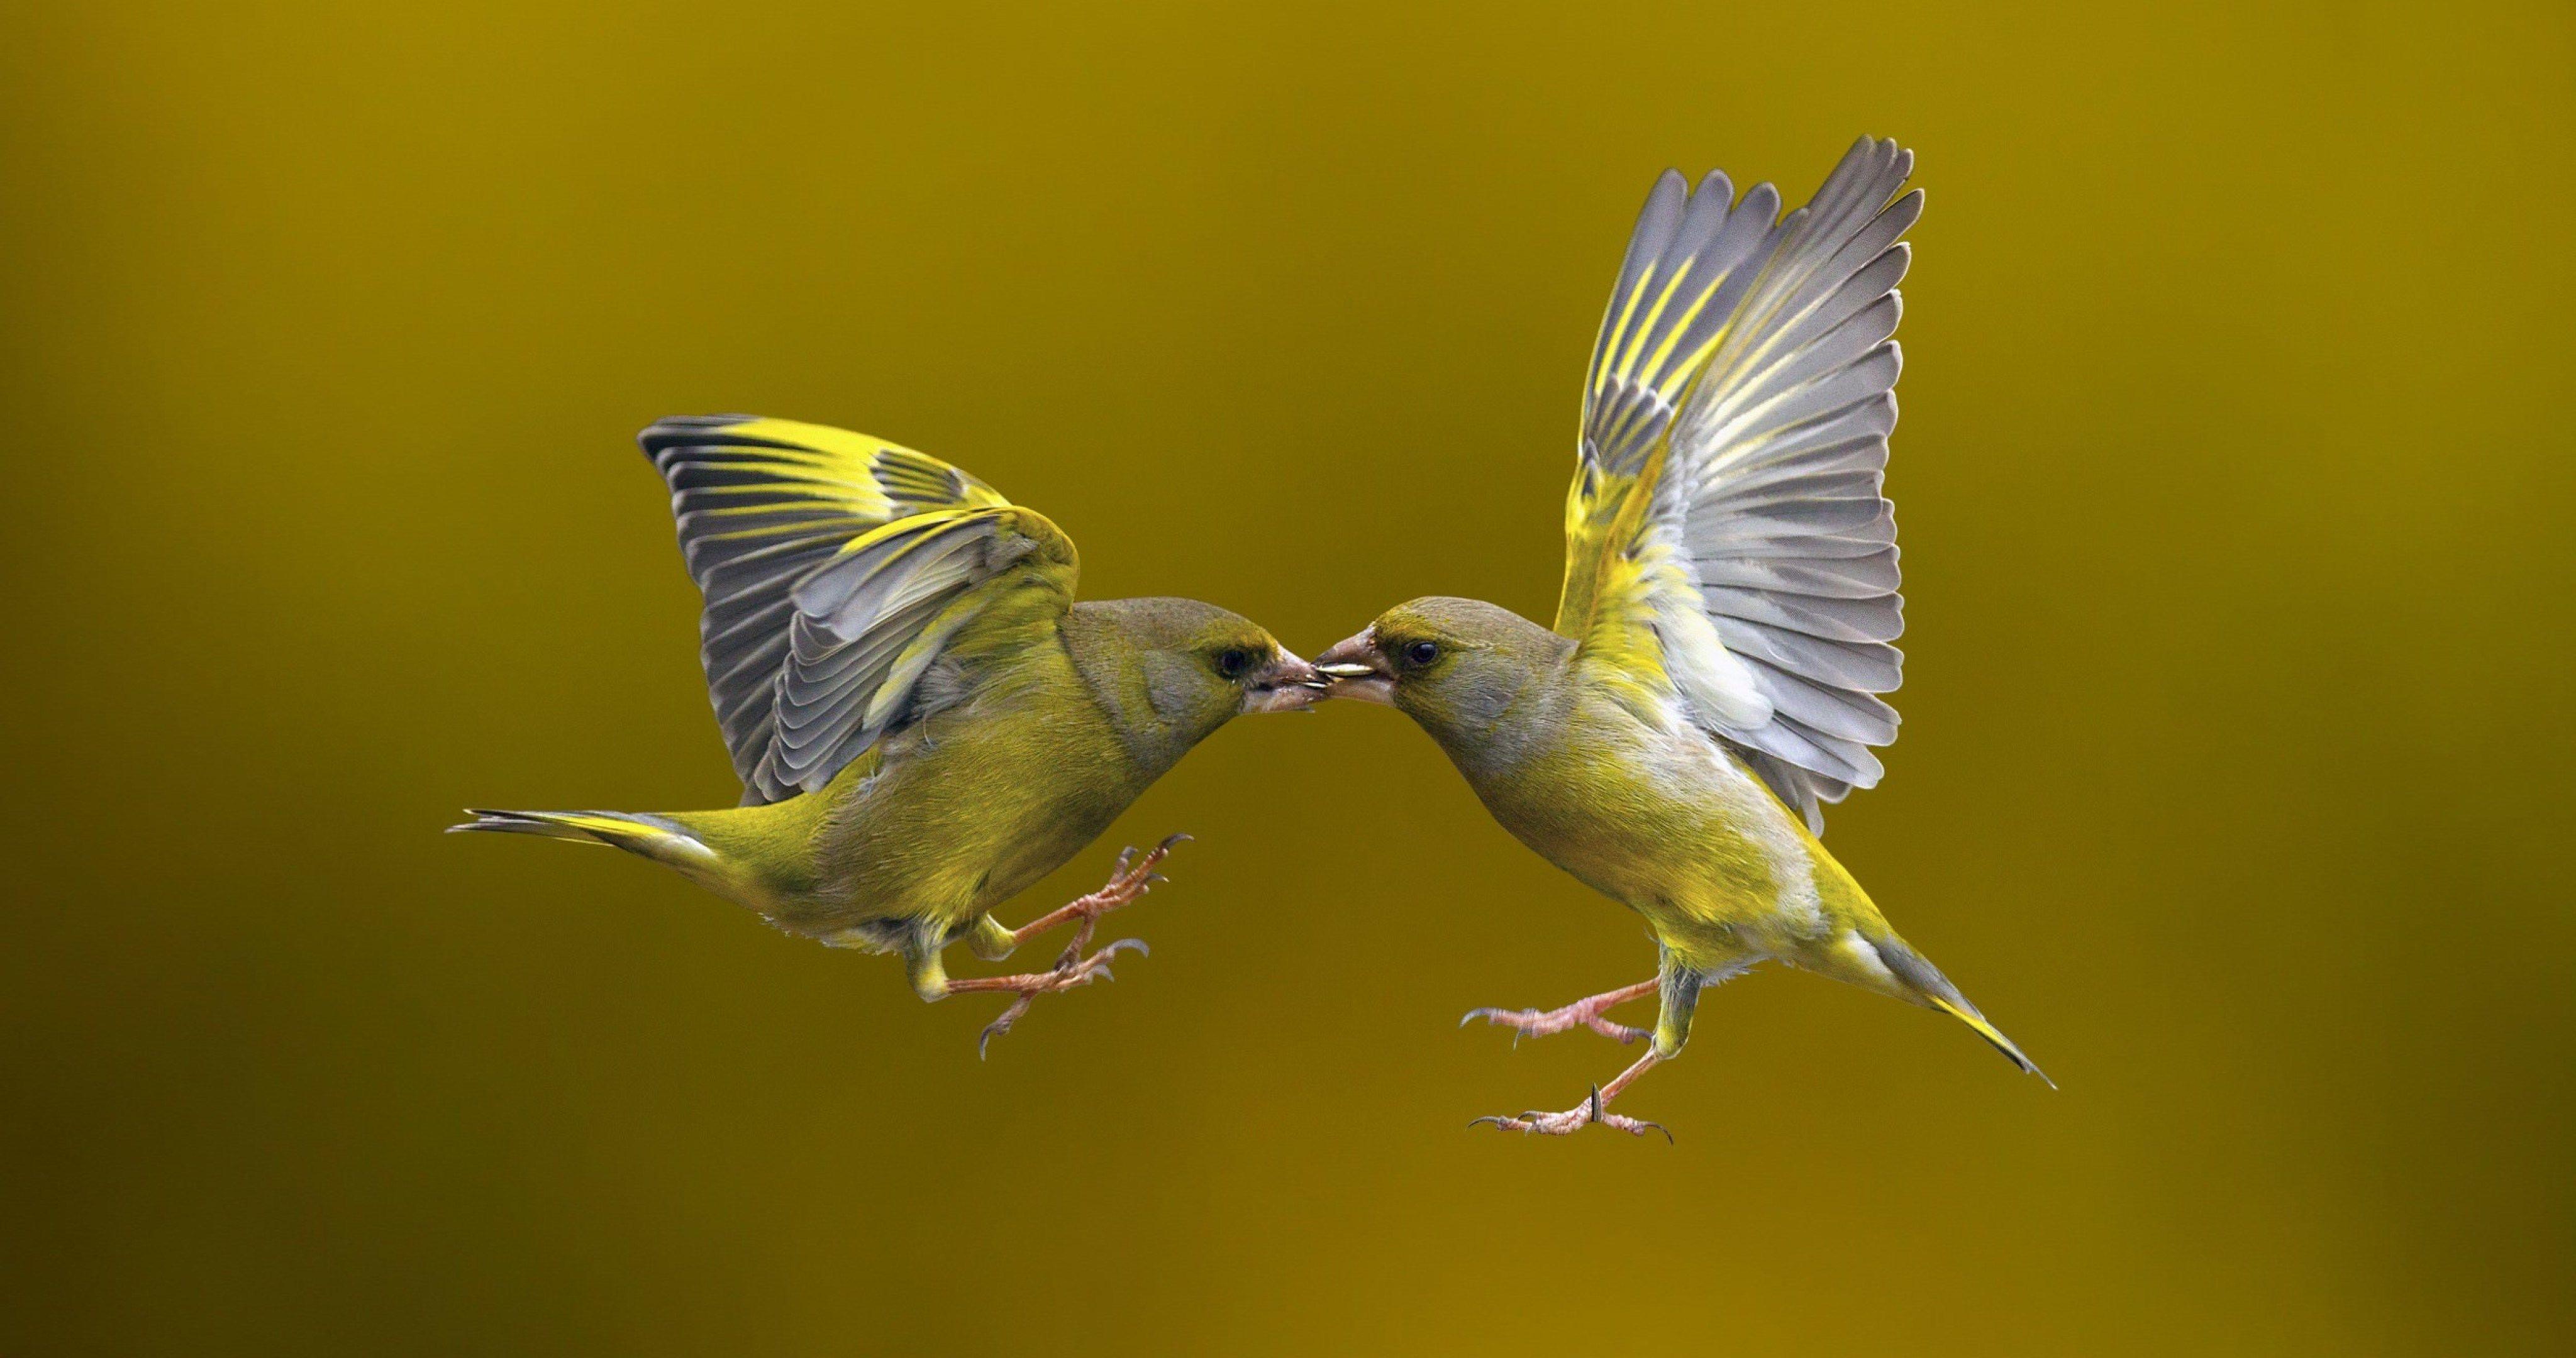 Hummingbird 4k Ultra Hd Wallpaper Bird Photography Bird Photo Birds Flying